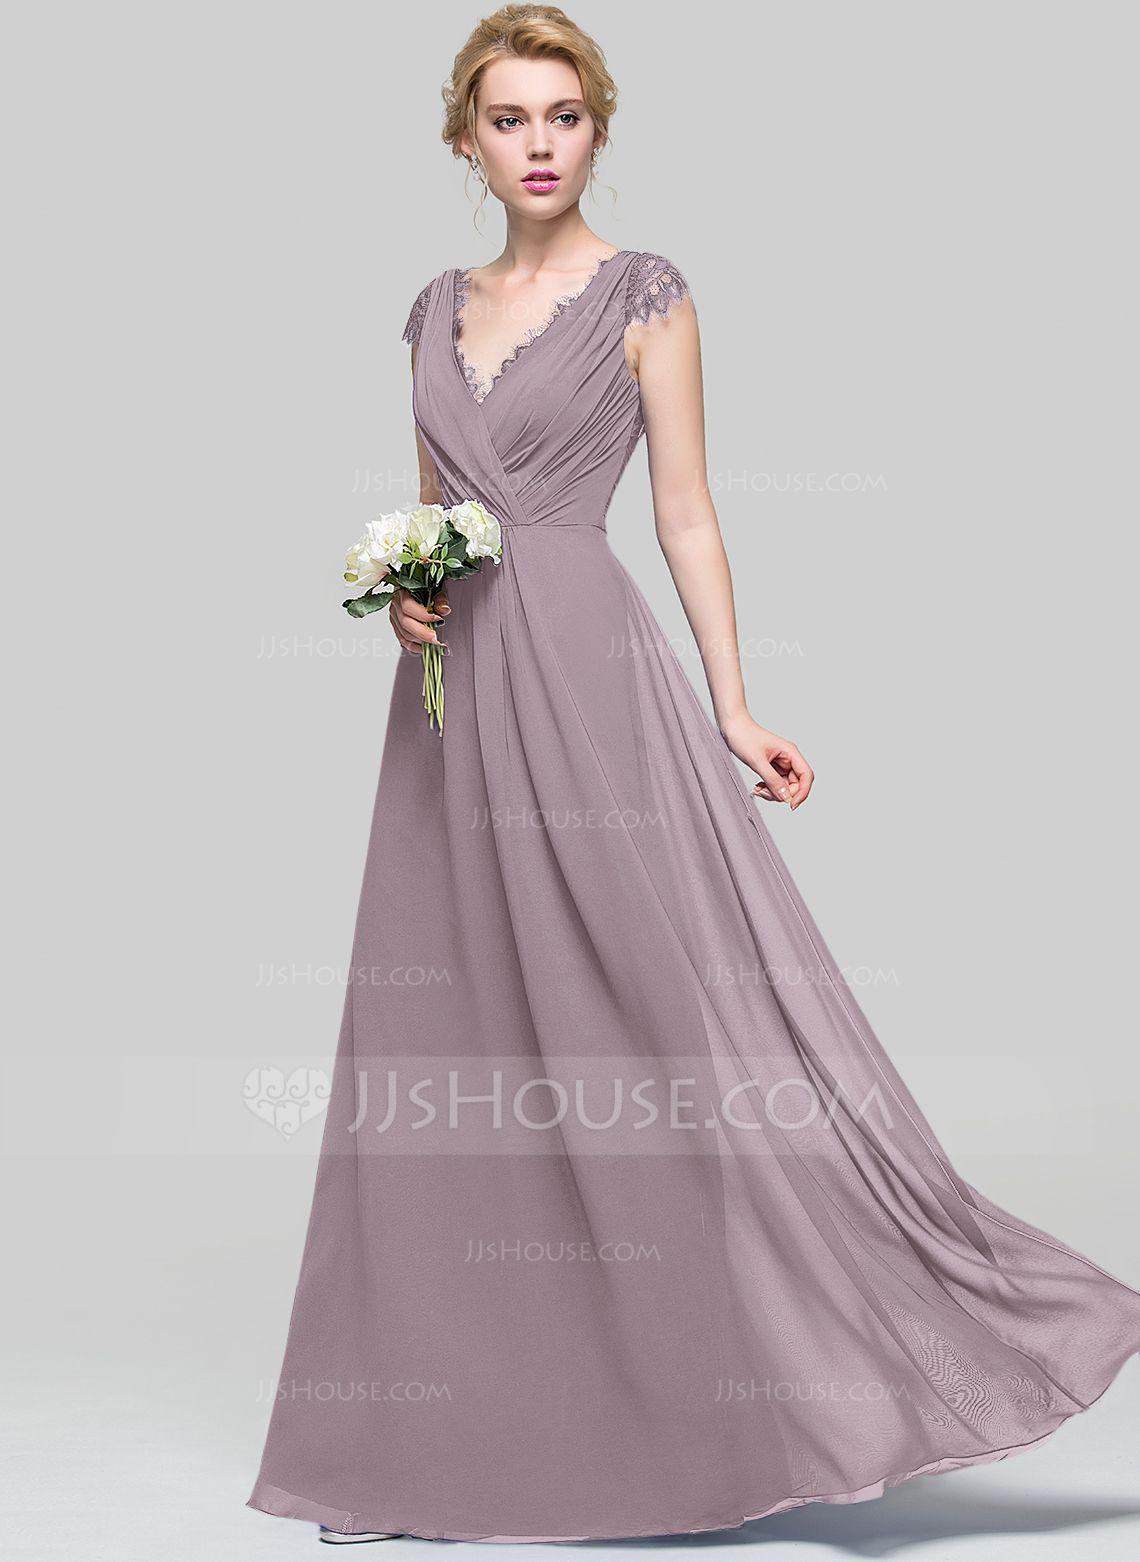 Jjshouse chiffon bridesmaid dress in dusk bridesmaid dresses jjshouse chiffon bridesmaid dress in dusk ombrellifo Image collections